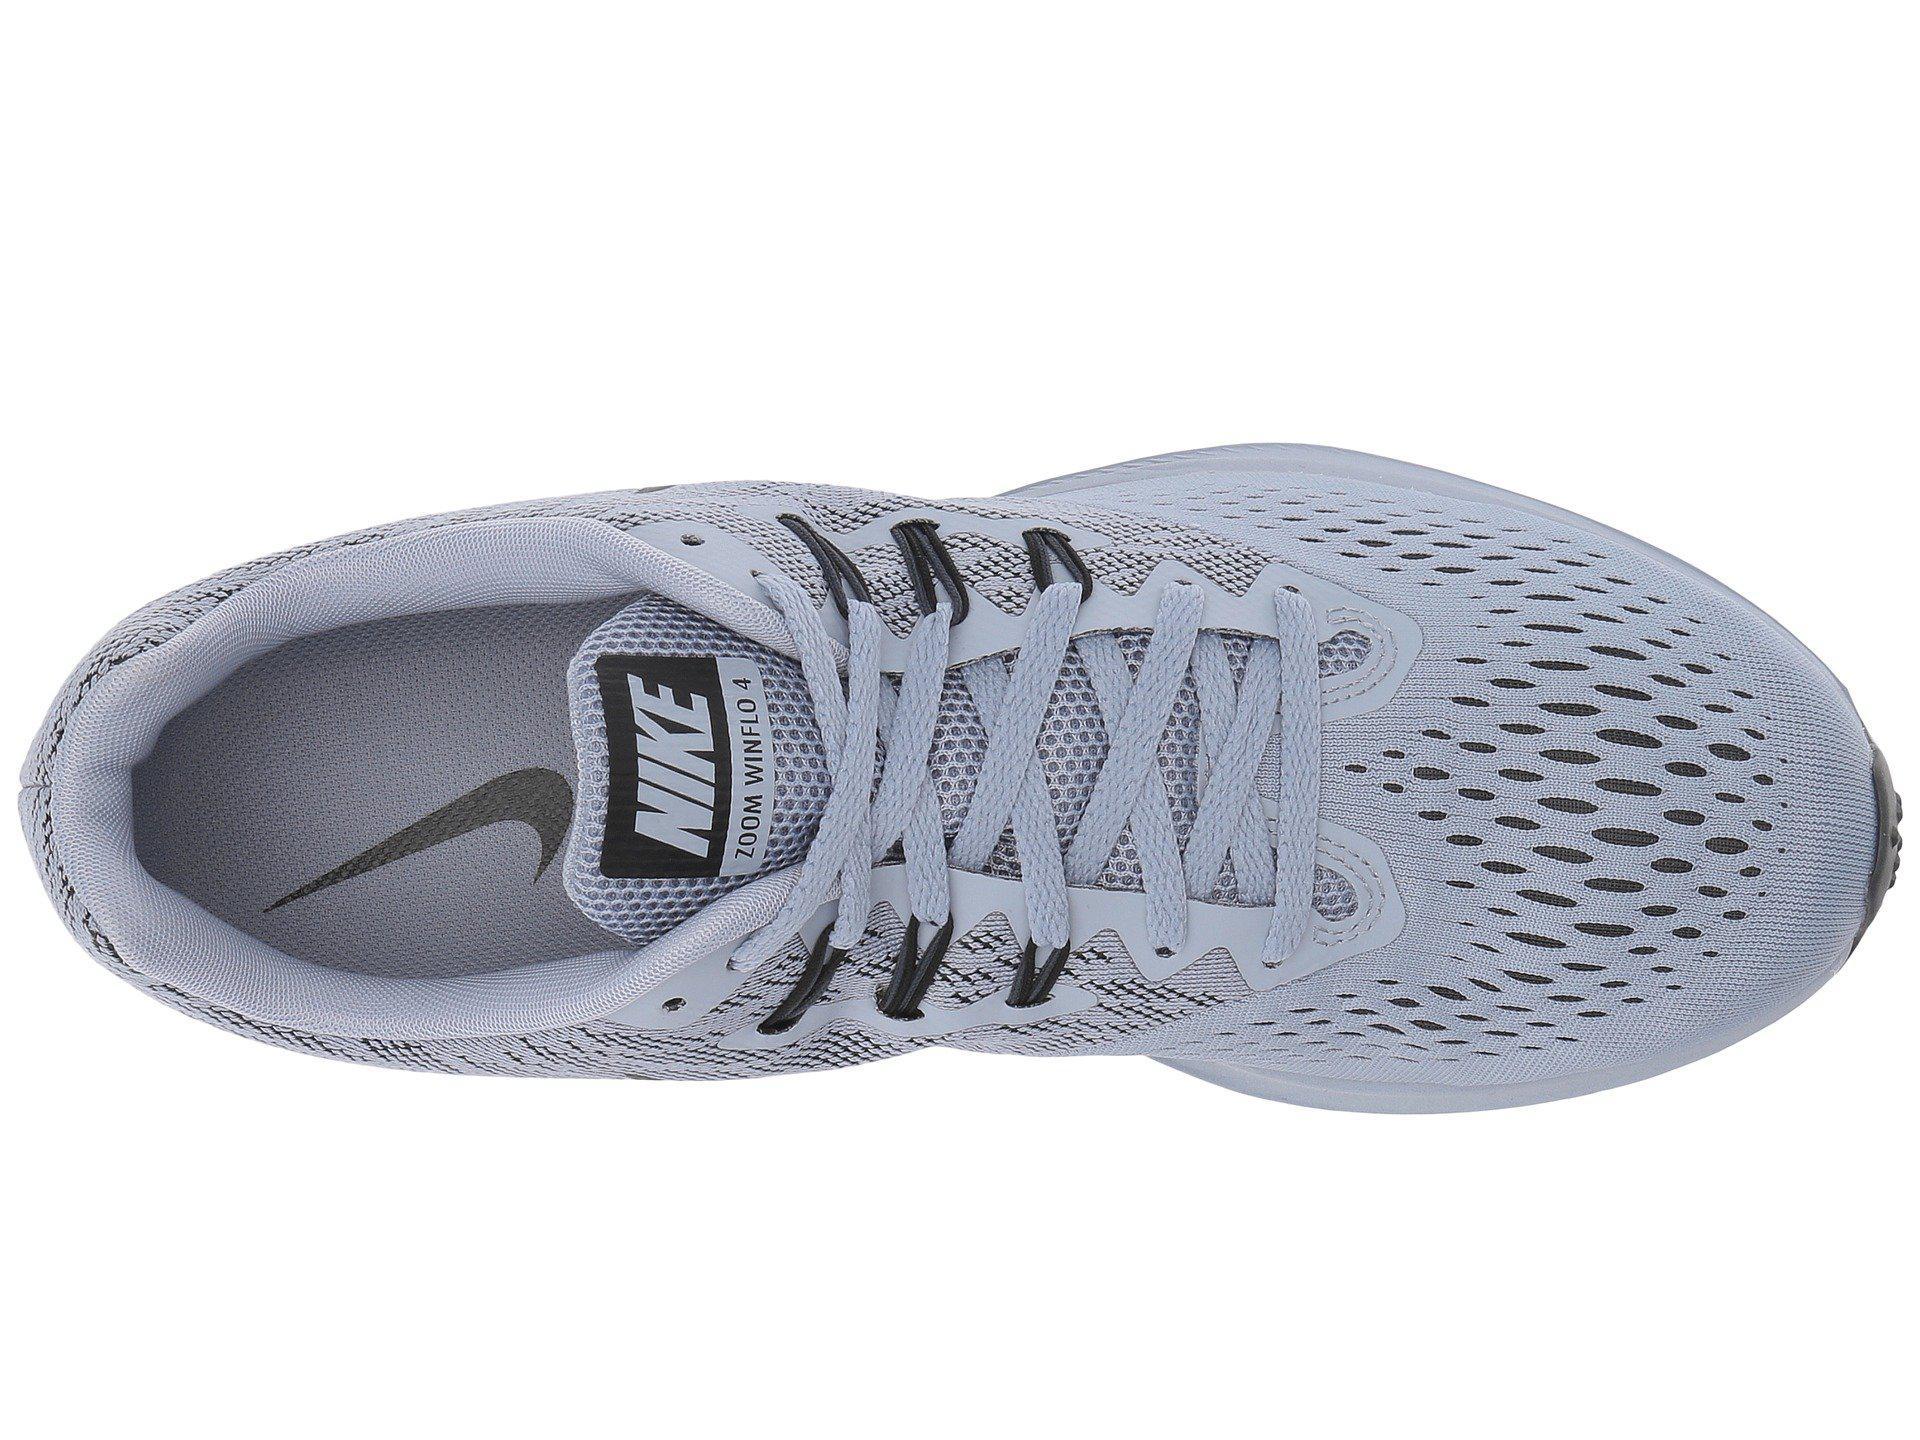 5bc9657ac9011 Lyst - Nike Zoom Winflo 4 (pure Platinum black hyper Royal white ...